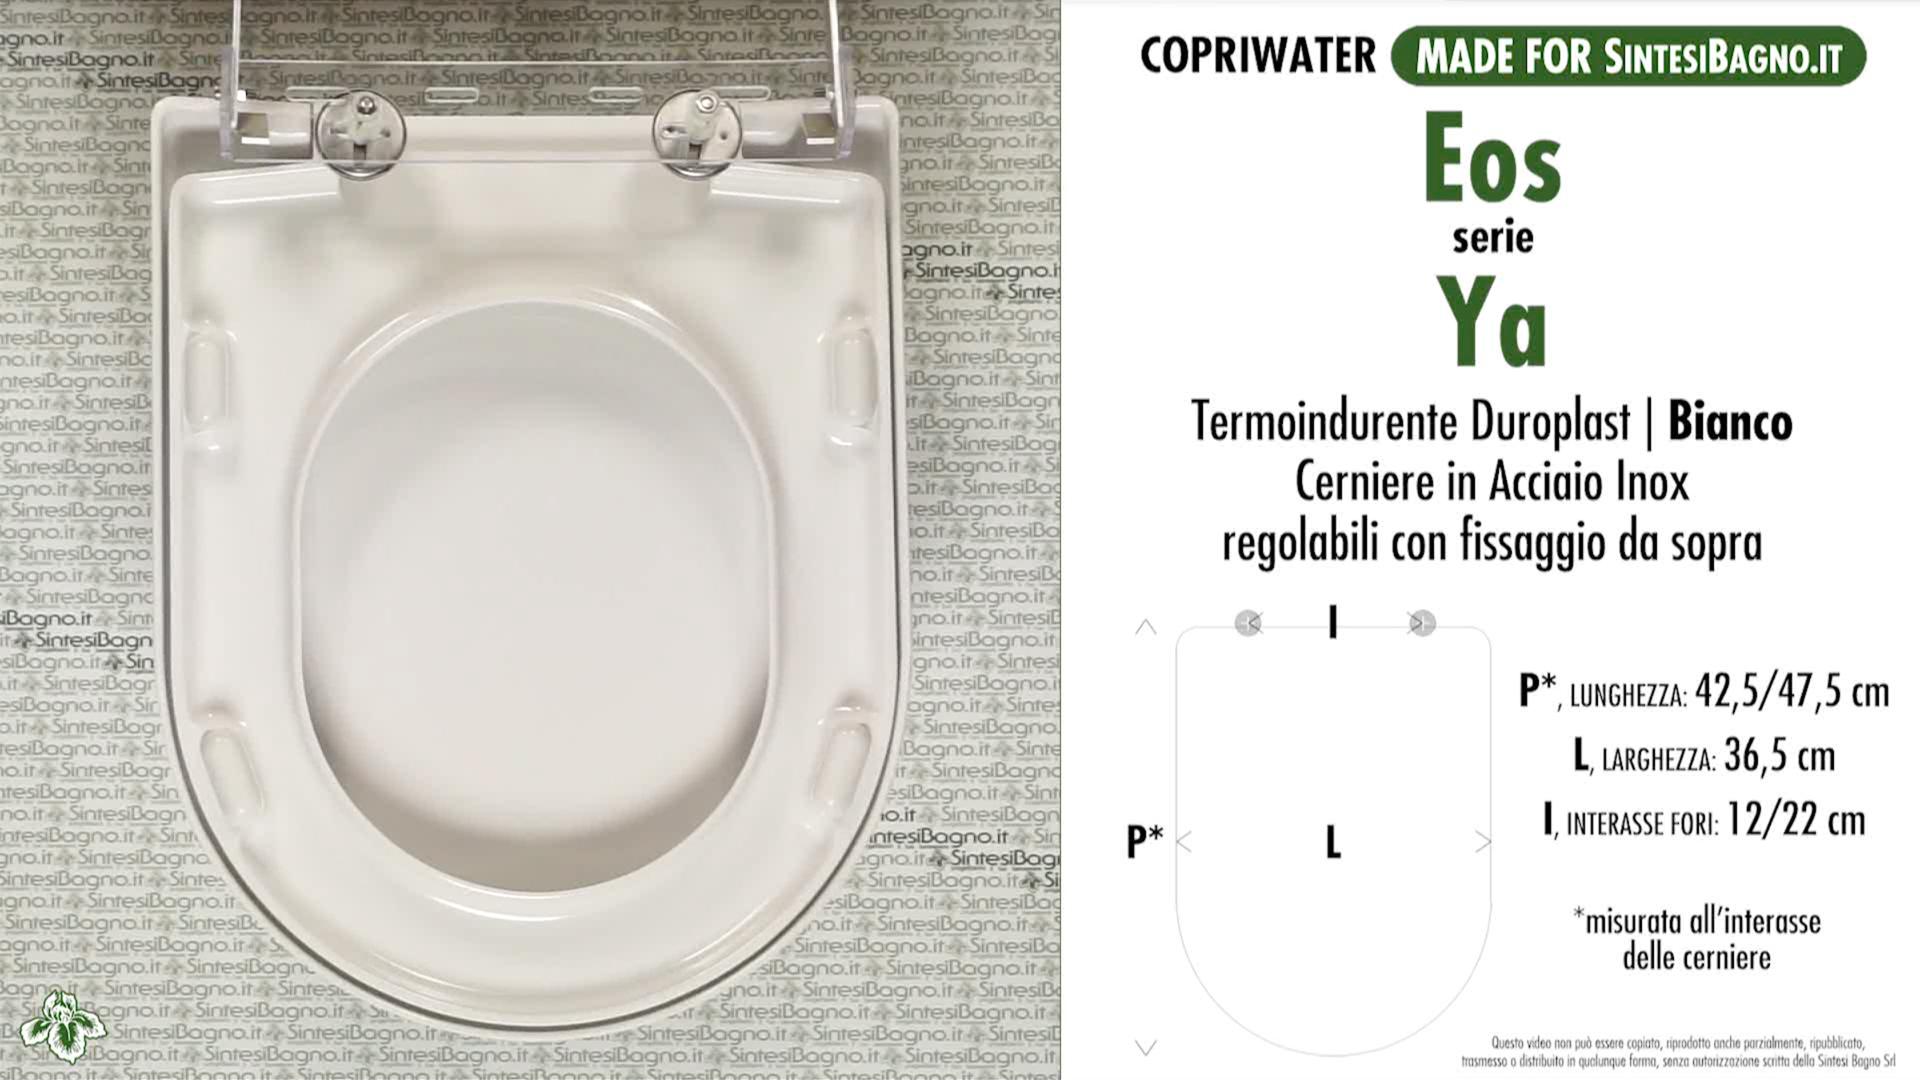 SCHEDA TECNICA MISURE copriwater EOS YA